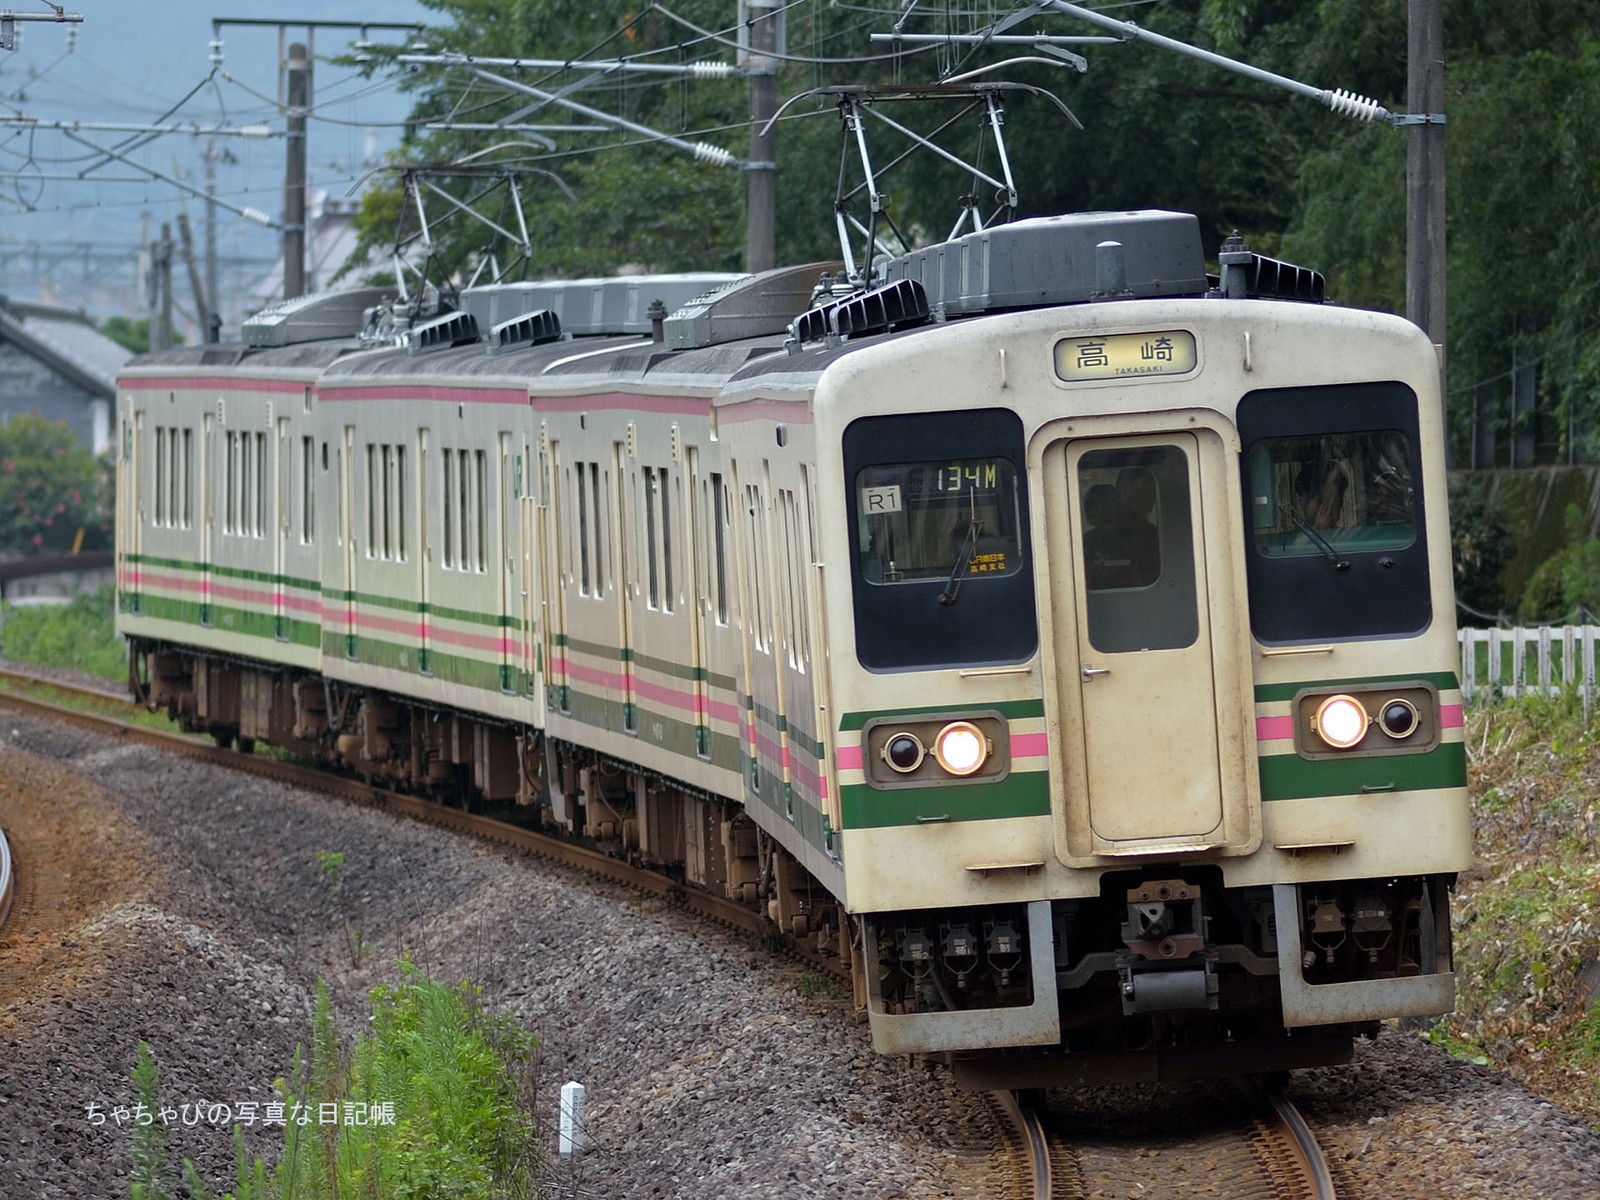 JR東日本 信越本線 西松井田駅~横川駅 107系100番台 -R1編成-